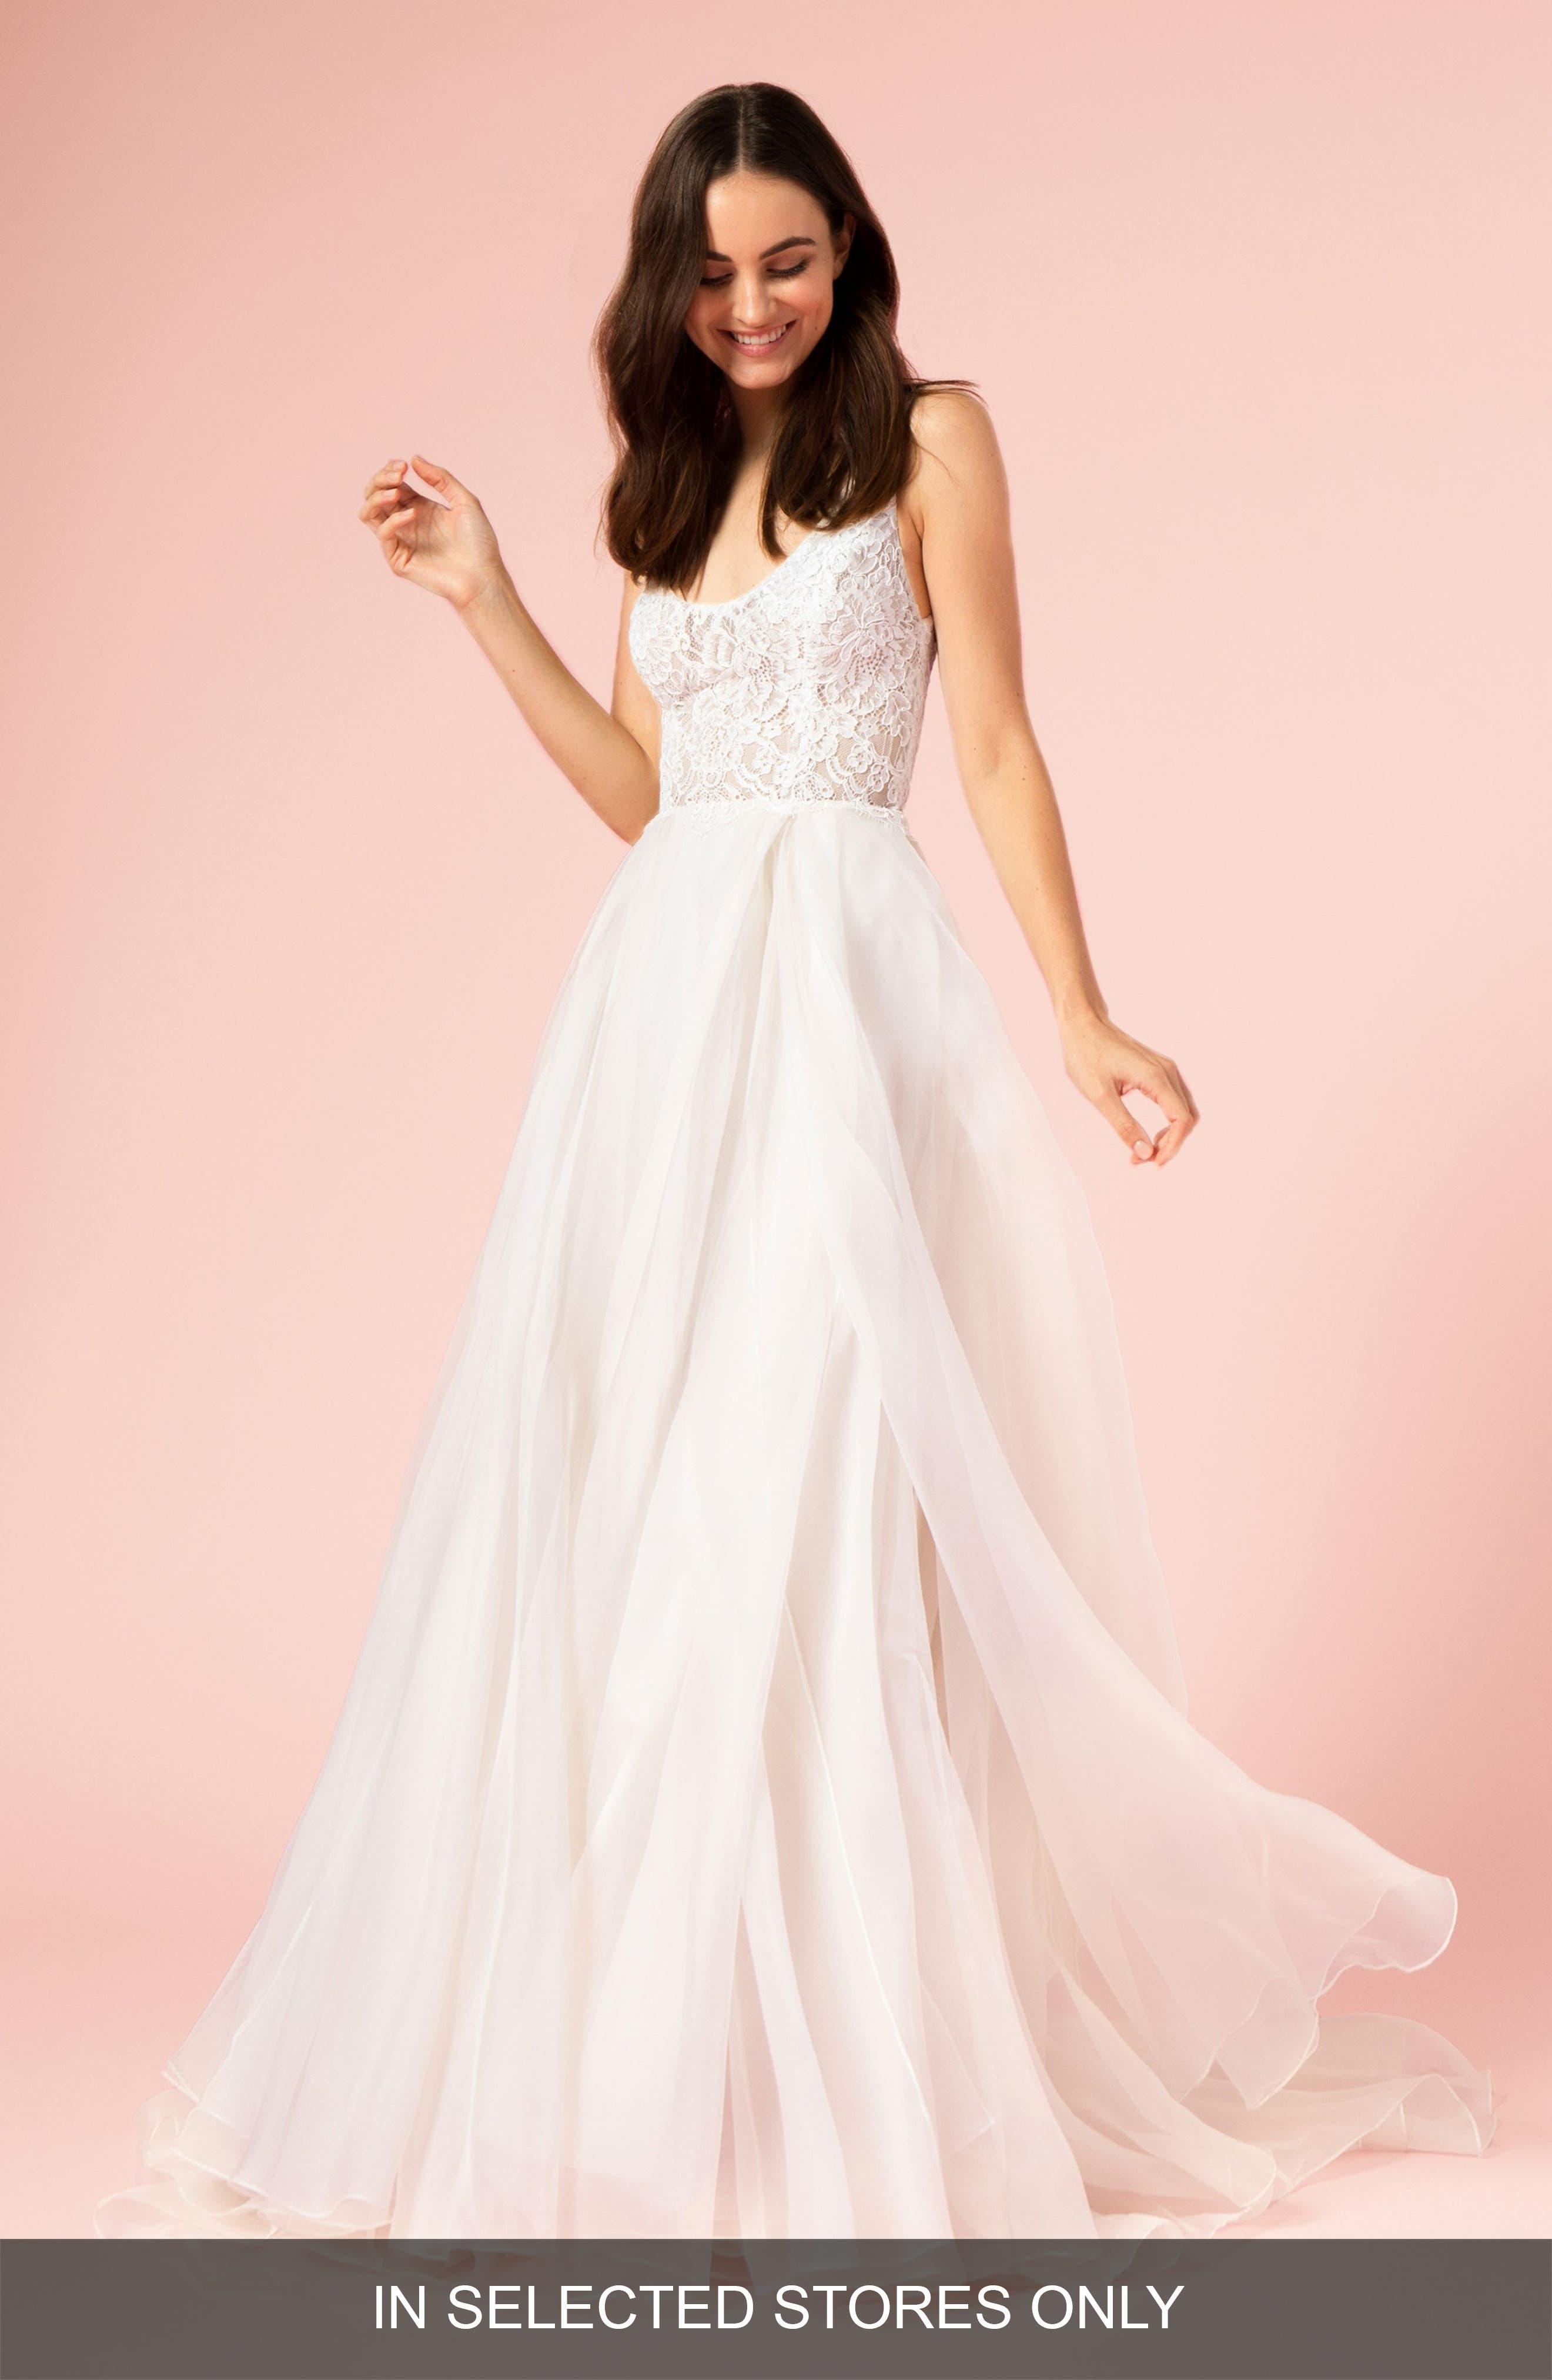 Lace Bodice Gown,                         Main,                         color, SILK WHITE/BLUSH